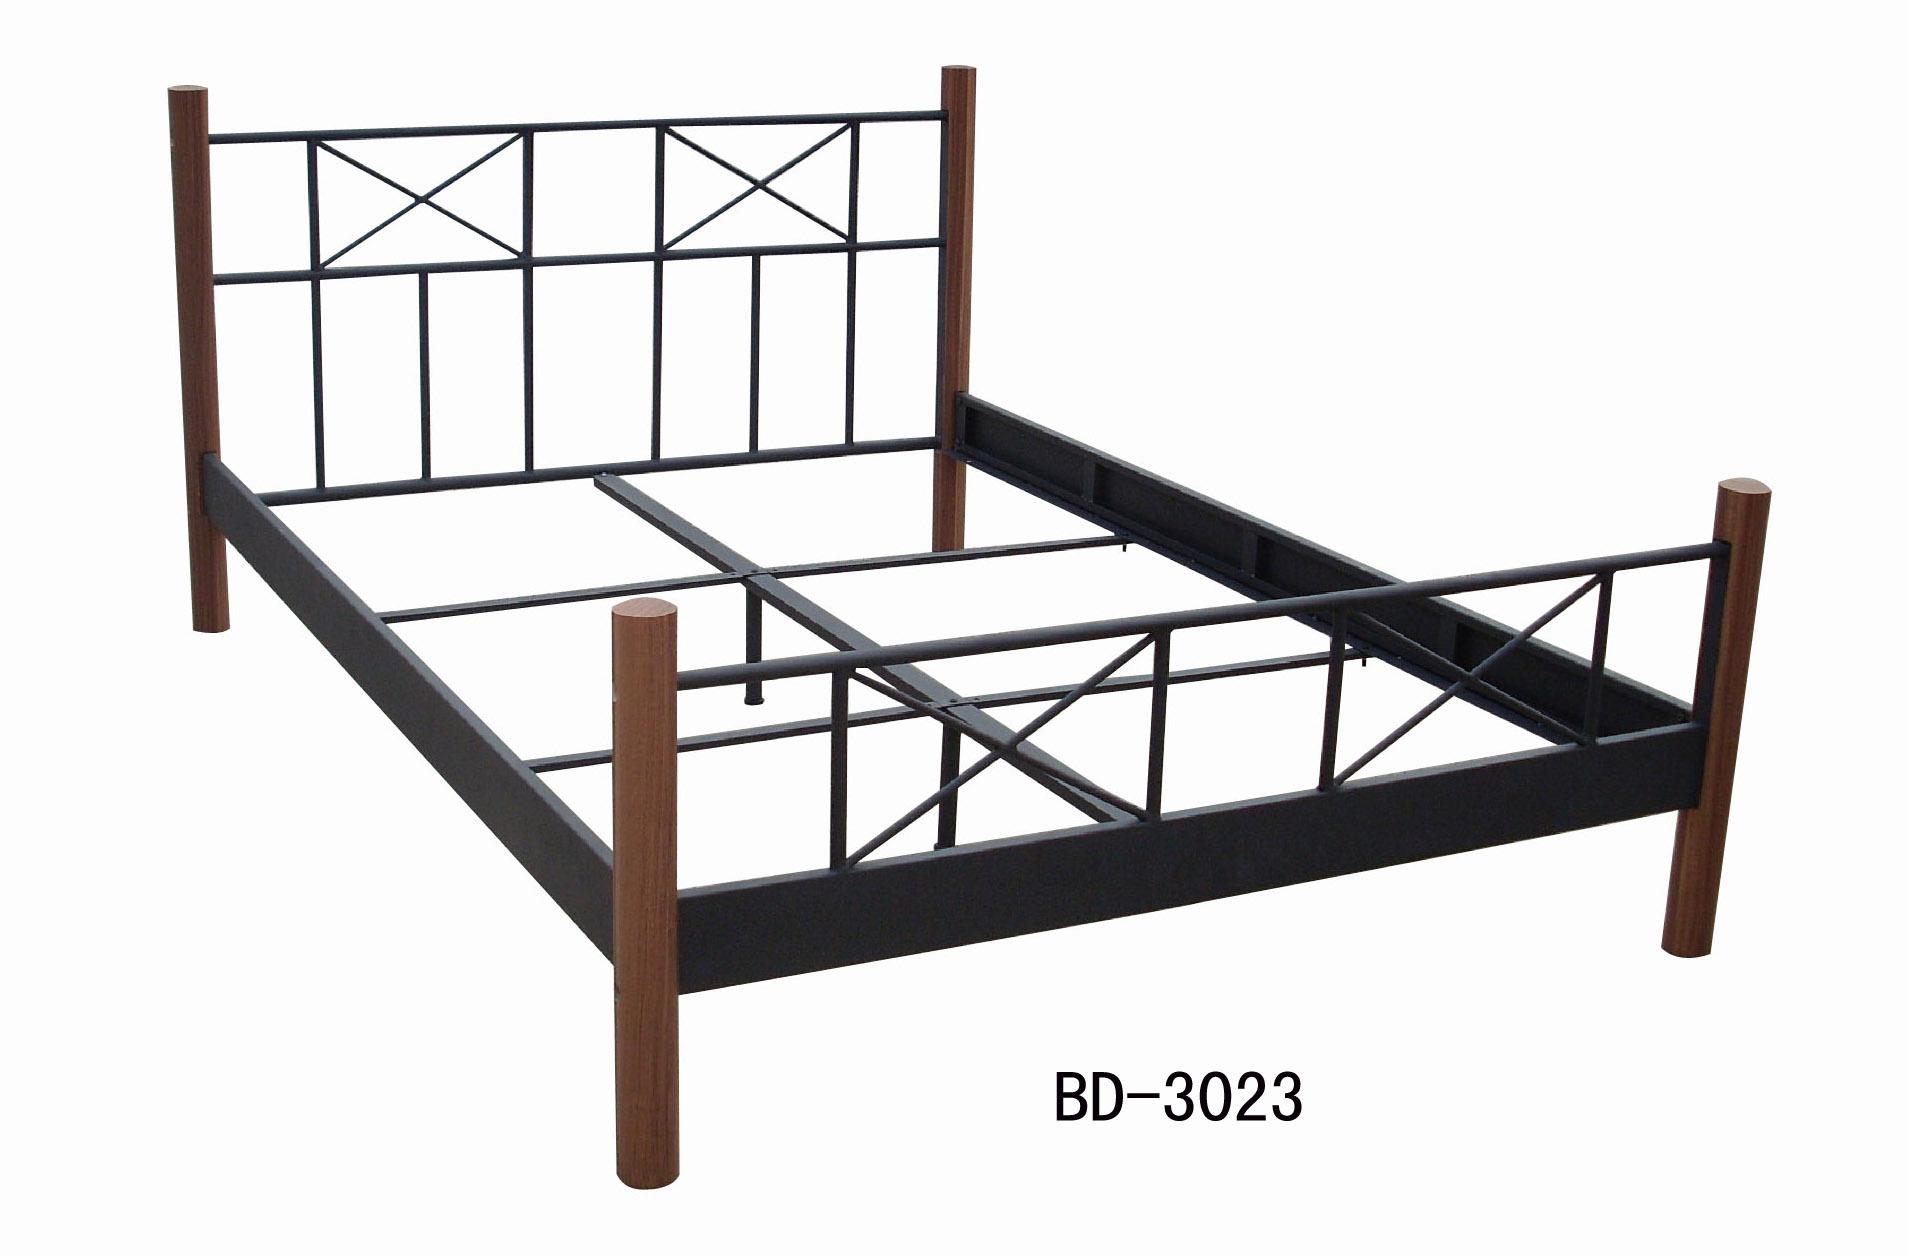 BD-3023